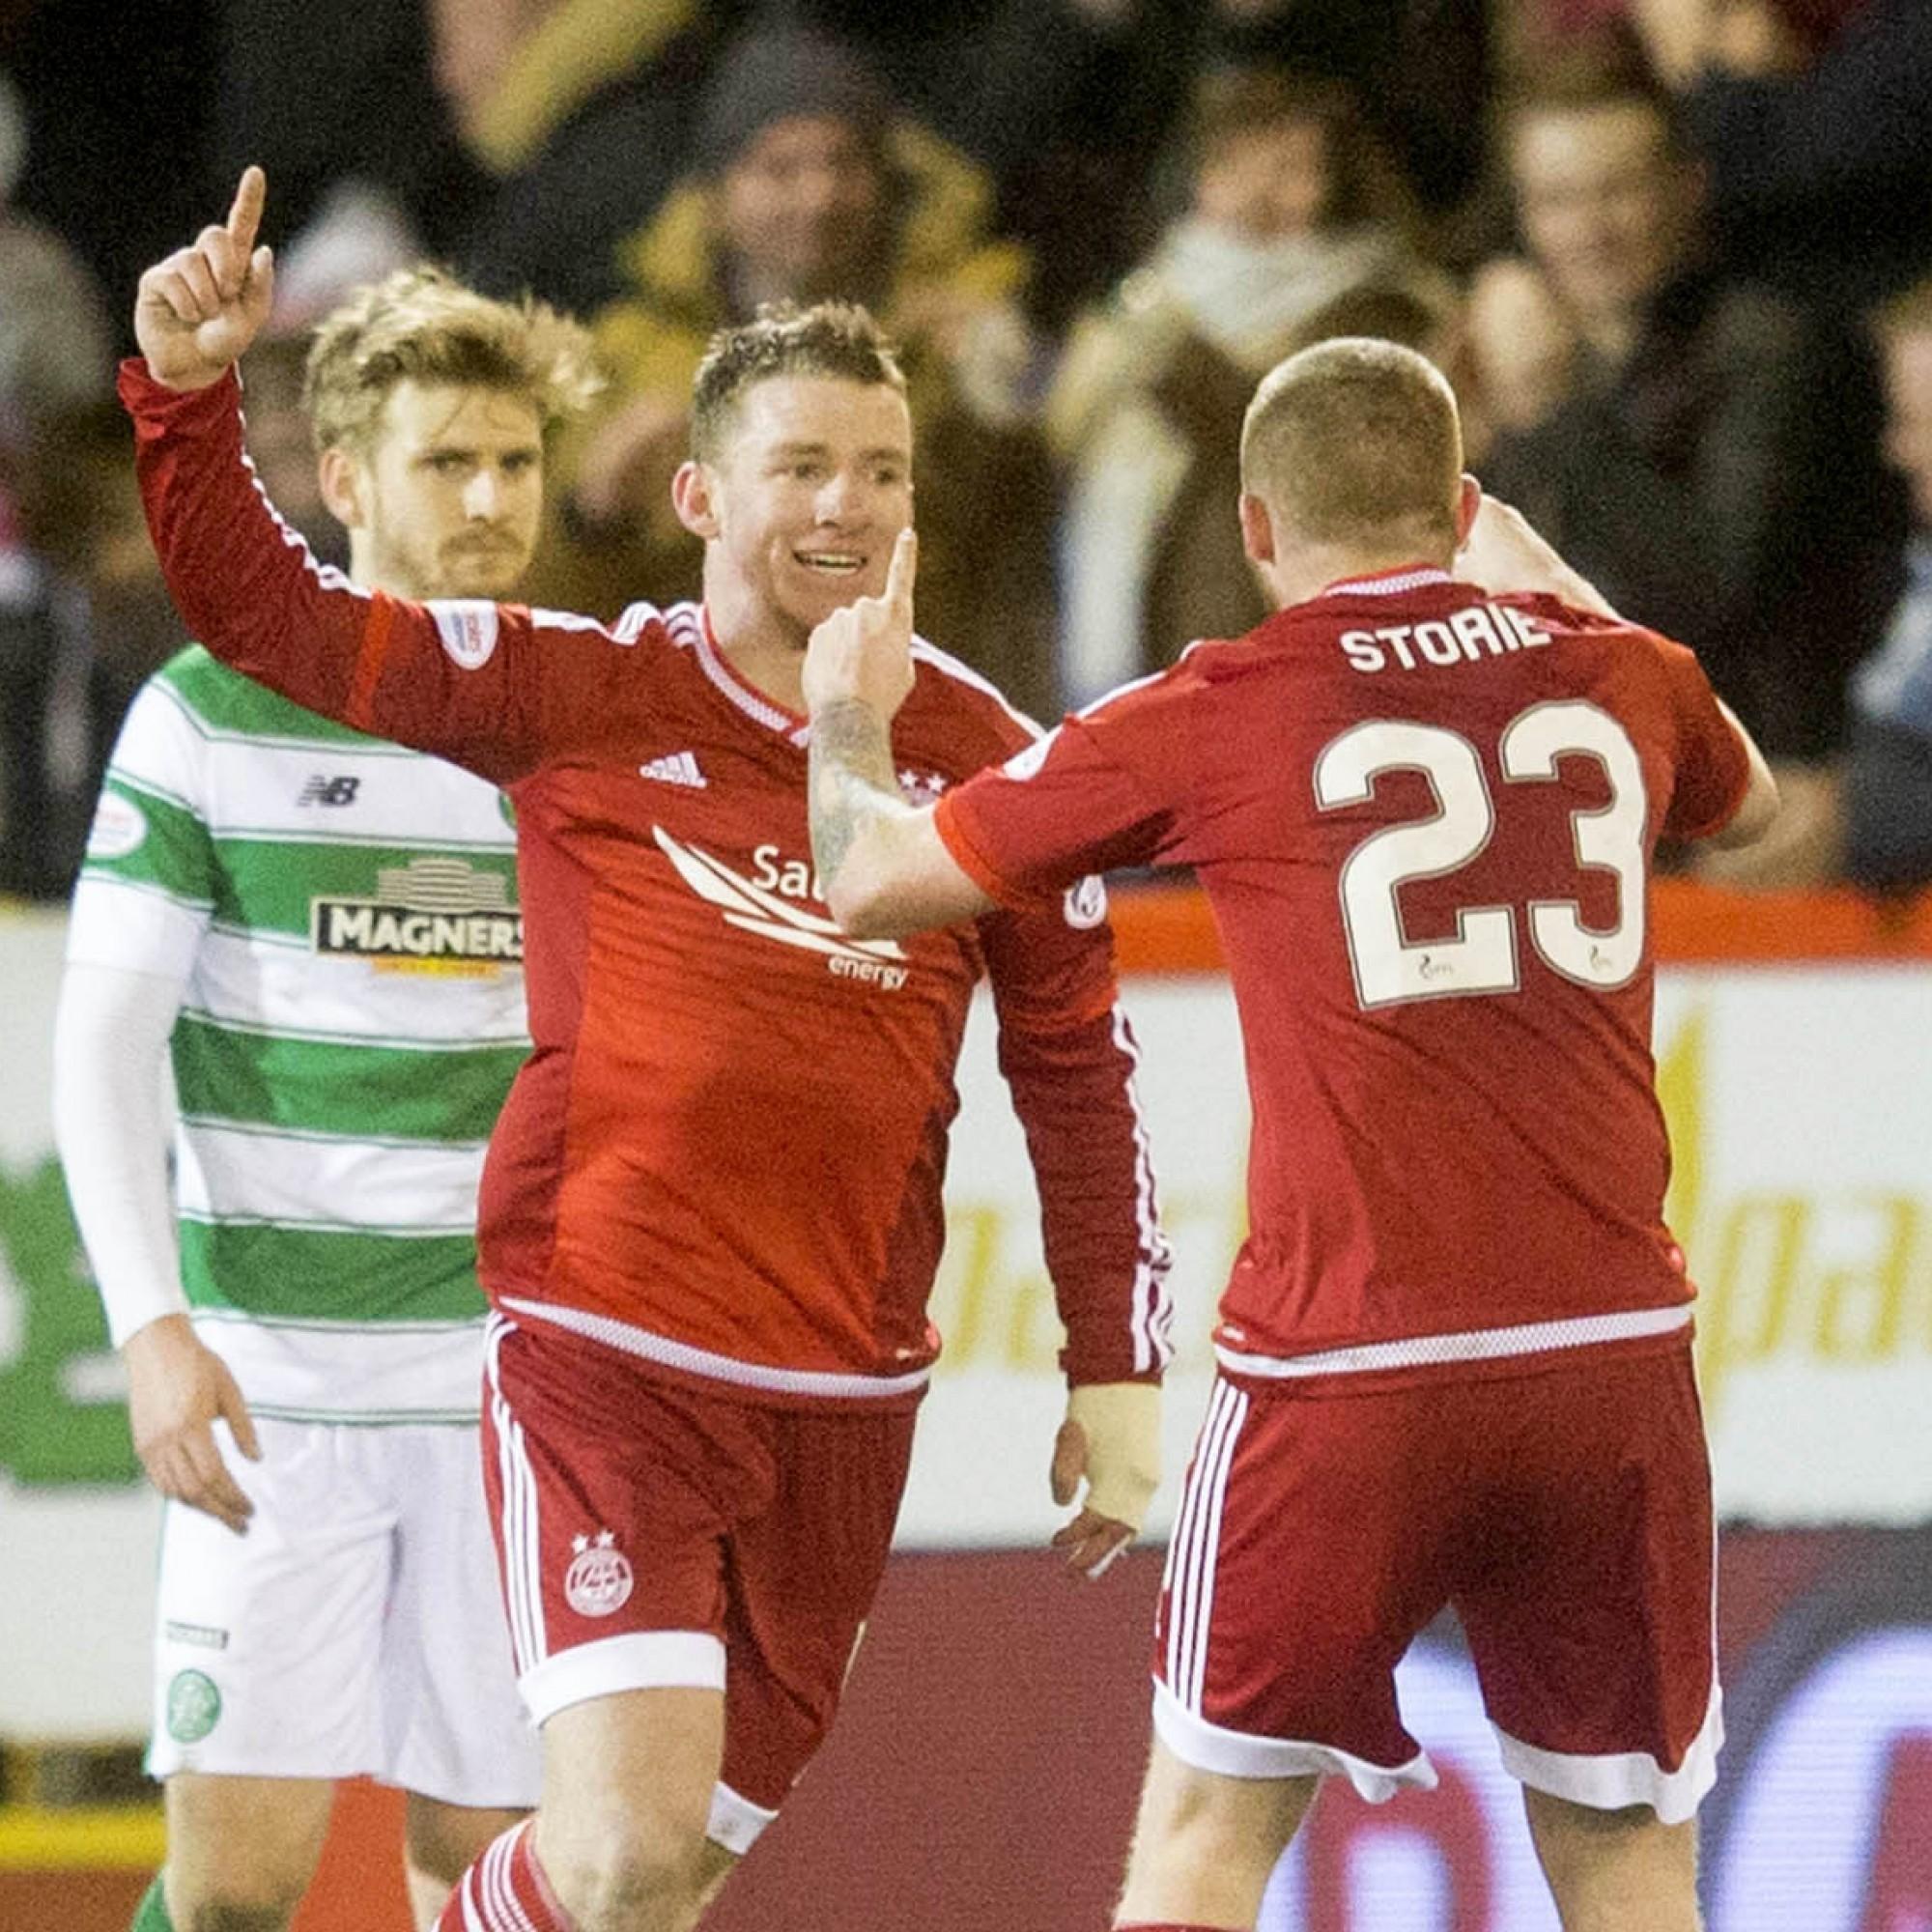 Irish international Jonny Hayes named in Scottish Premiership Team of the Year